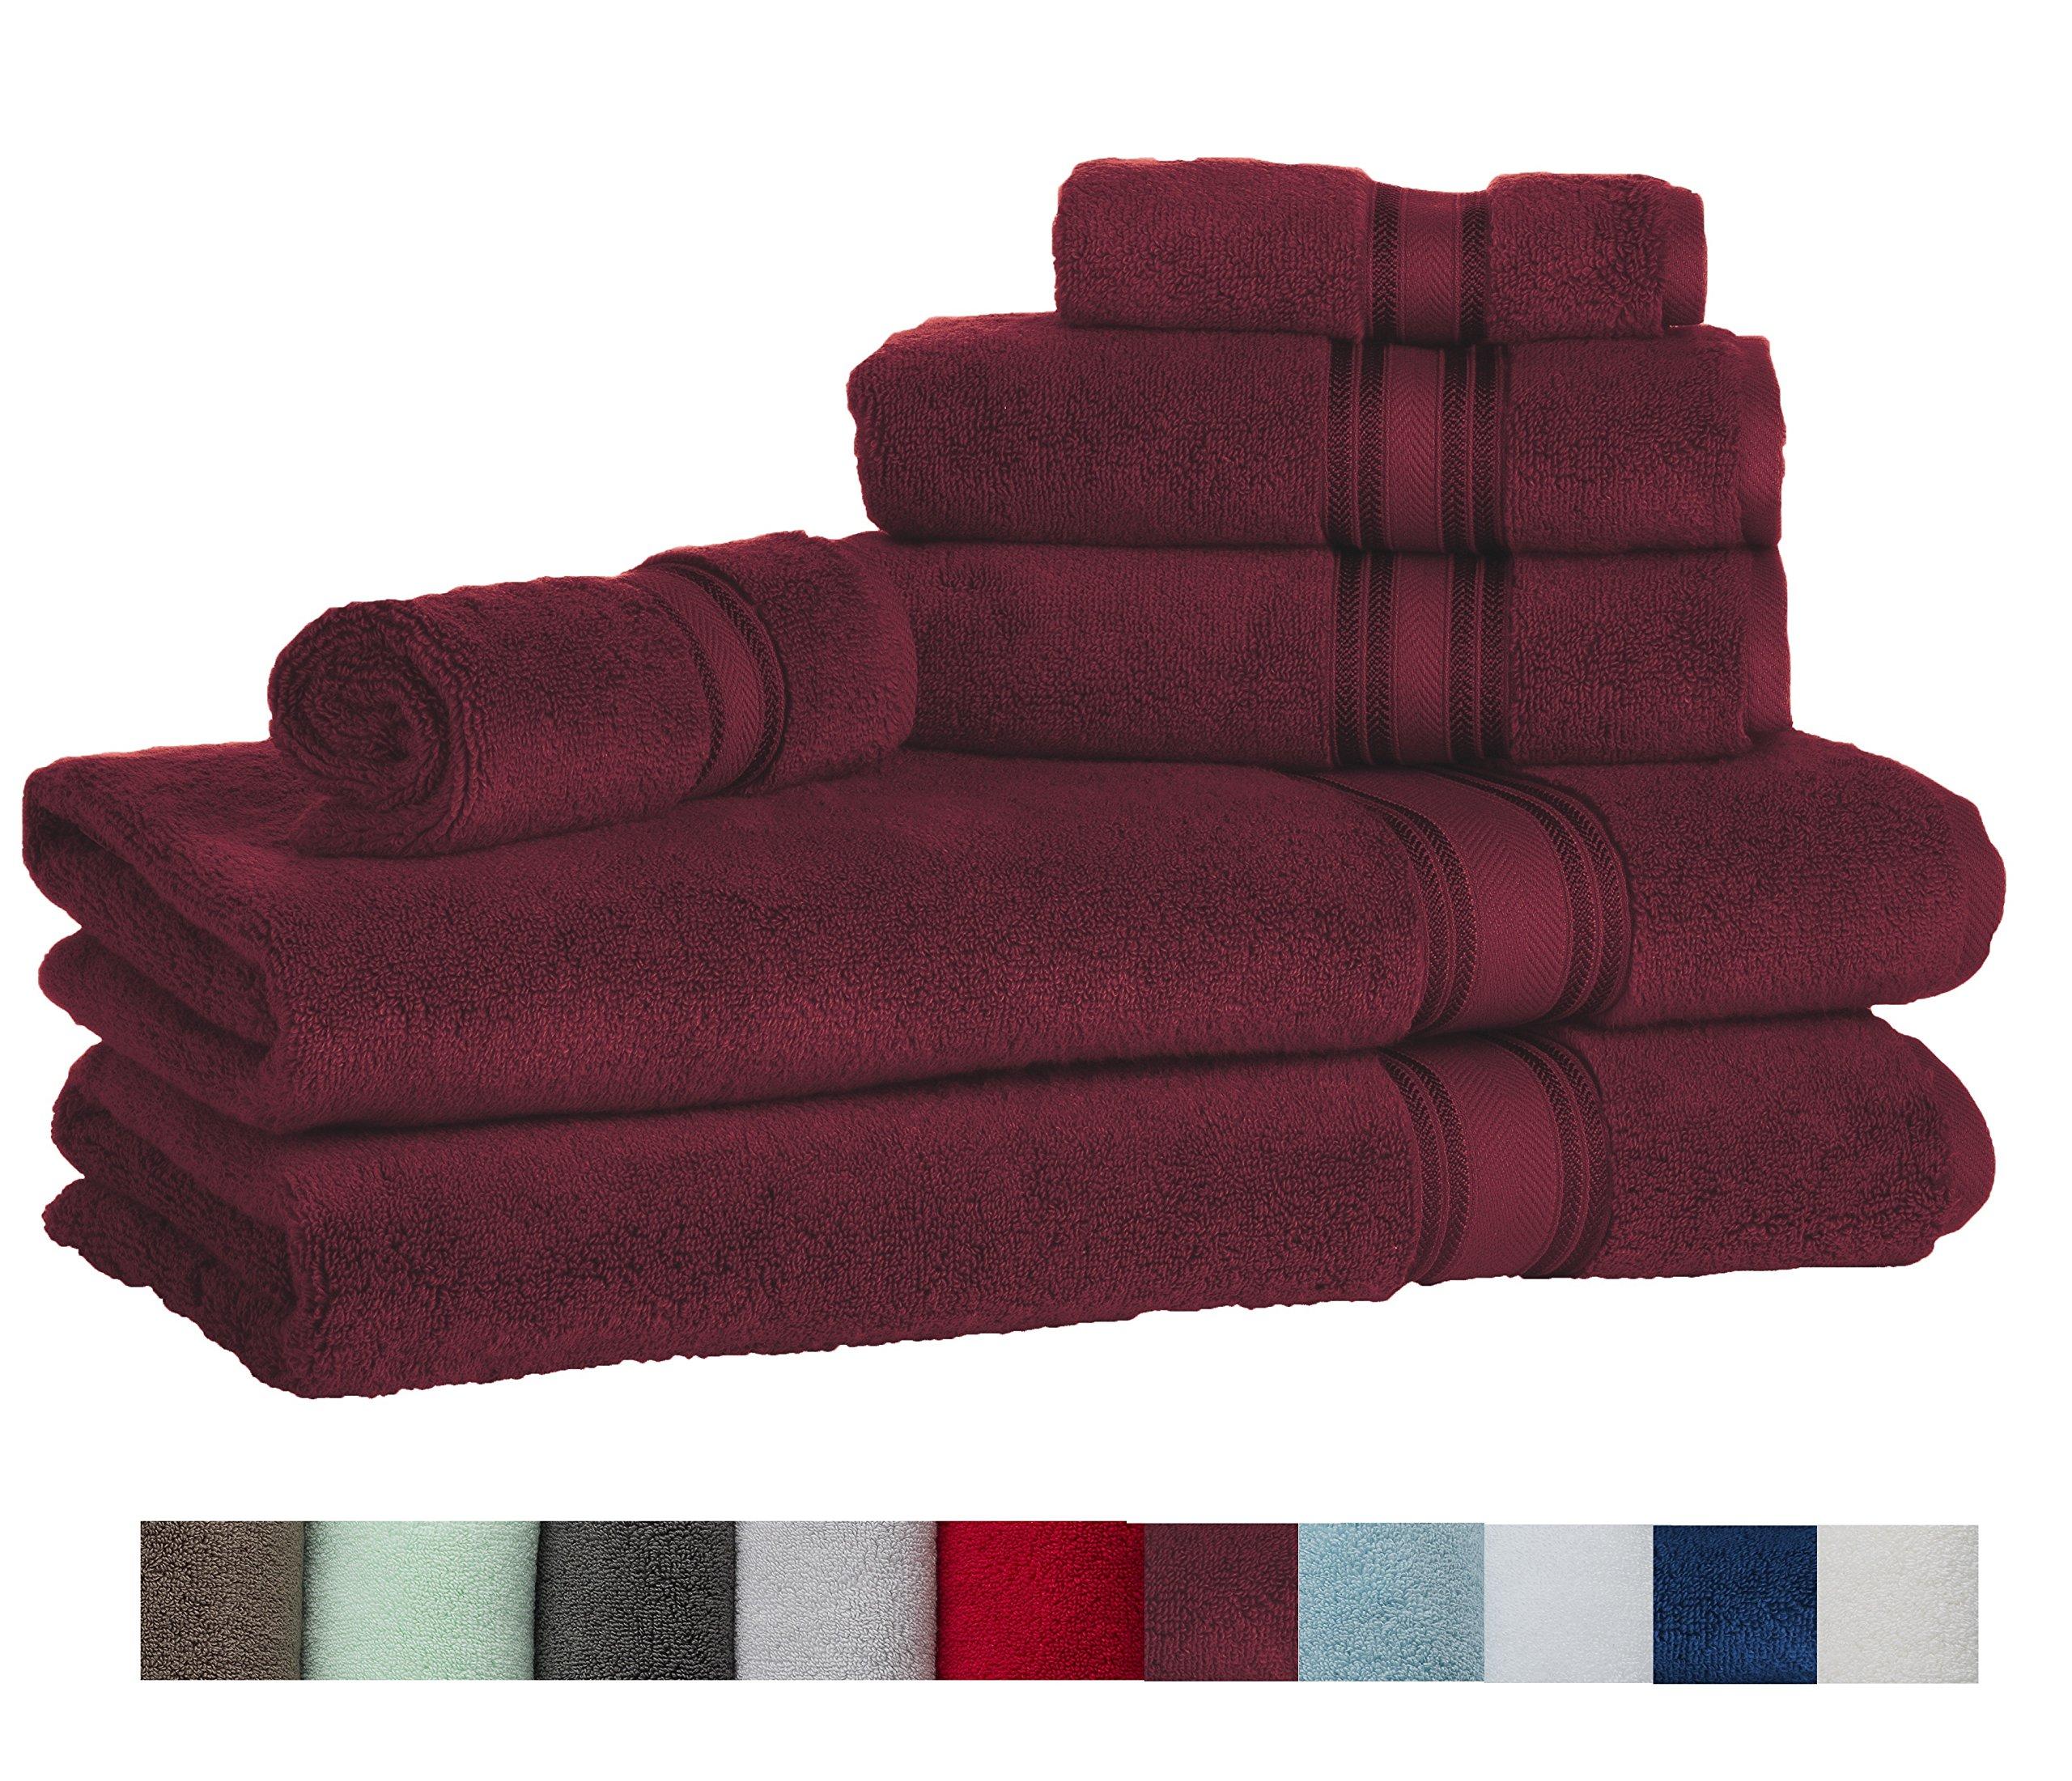 Casa Lino Quick Dry Super Zero Twist 6 Piece Bath Towel Set 7 Star Hotel Luxury Collection, 2 Bath Towel 28x54'', 2 Hand Towel- 16x28'', Face Towel- 13x13'' (burgundy)